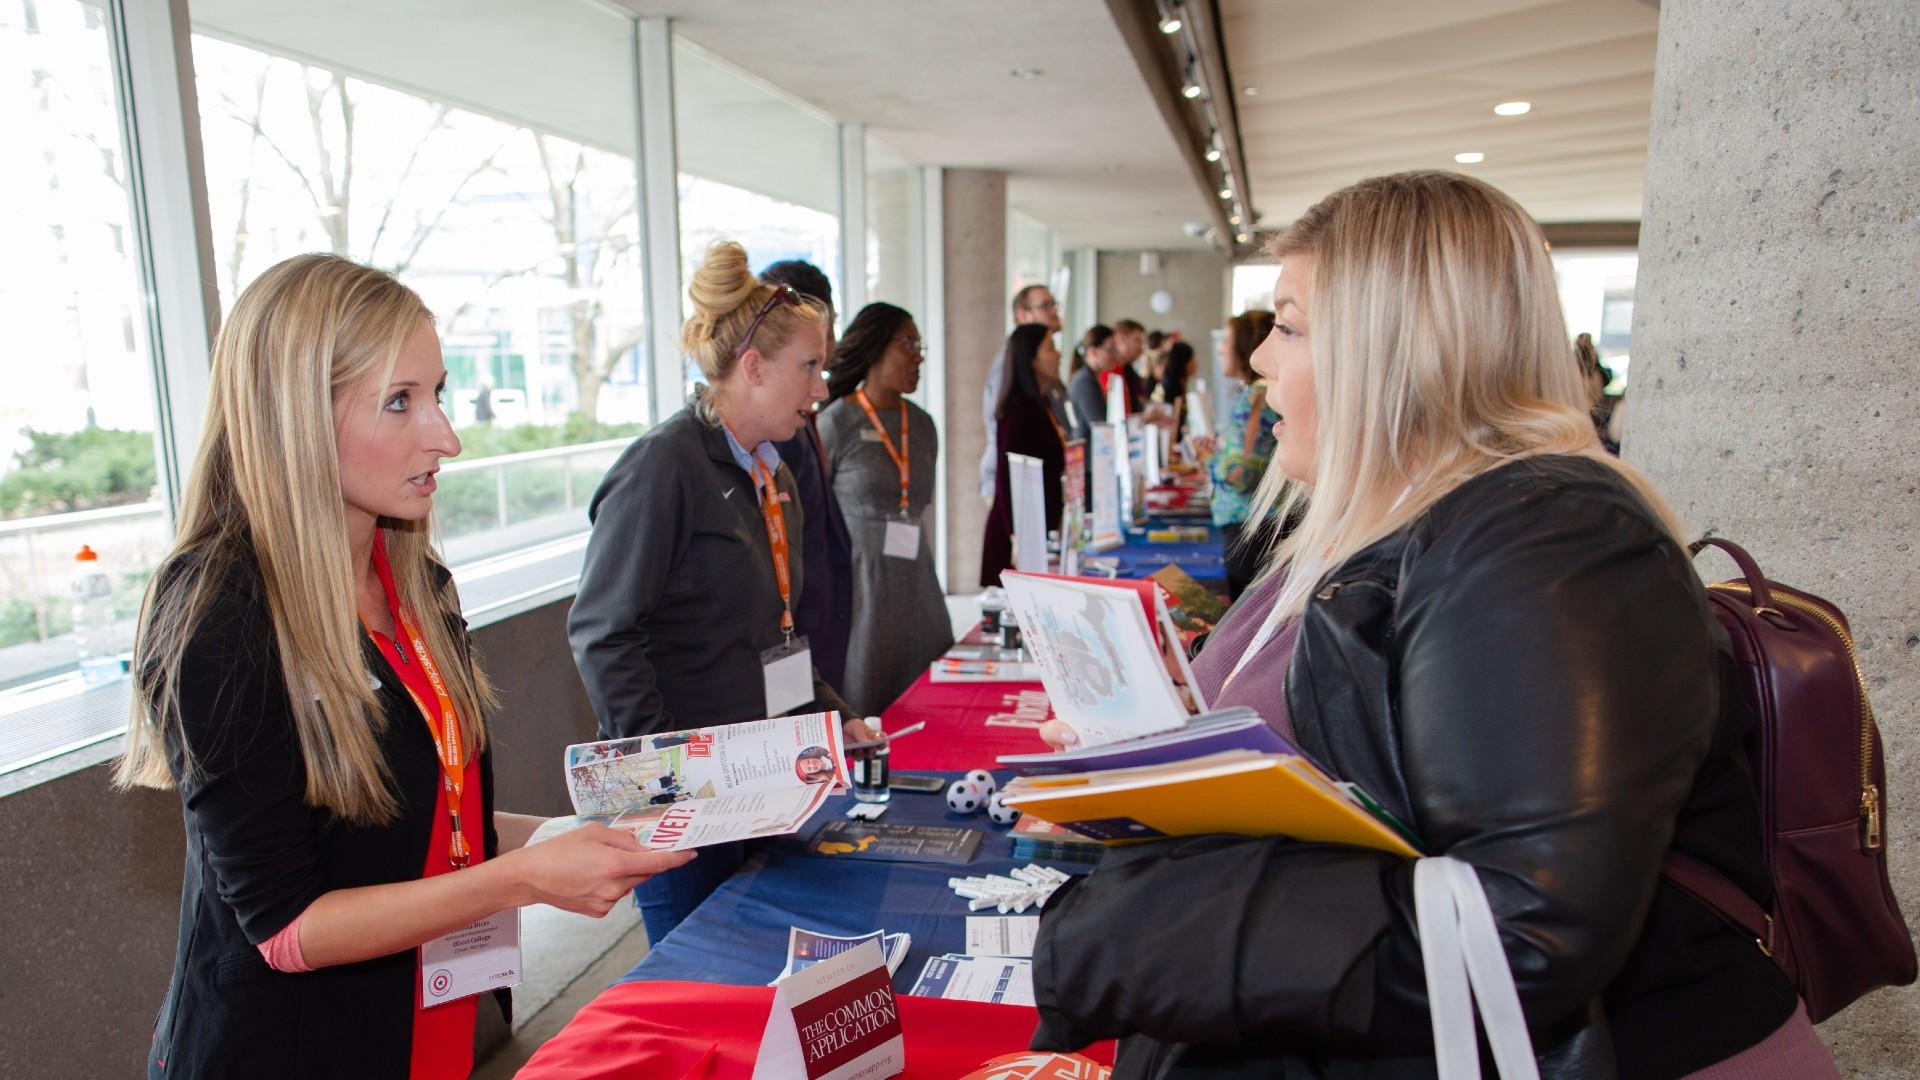 International Enrollment and Student Recruitment